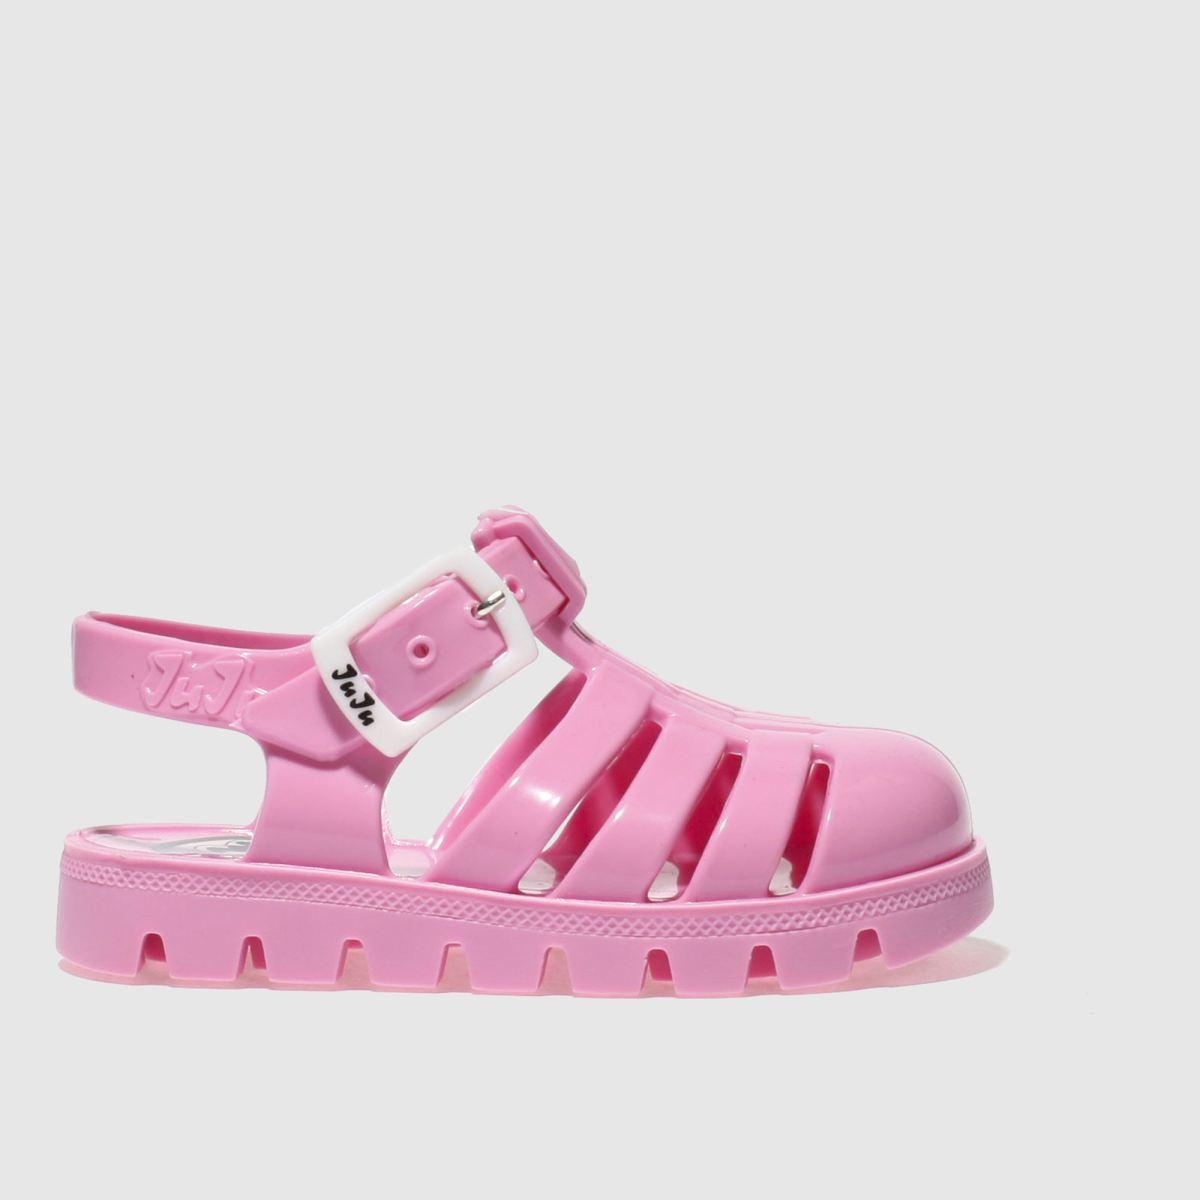 juju jellies Juju Jellies Pale Pink Nino Girls Toddler Sandals